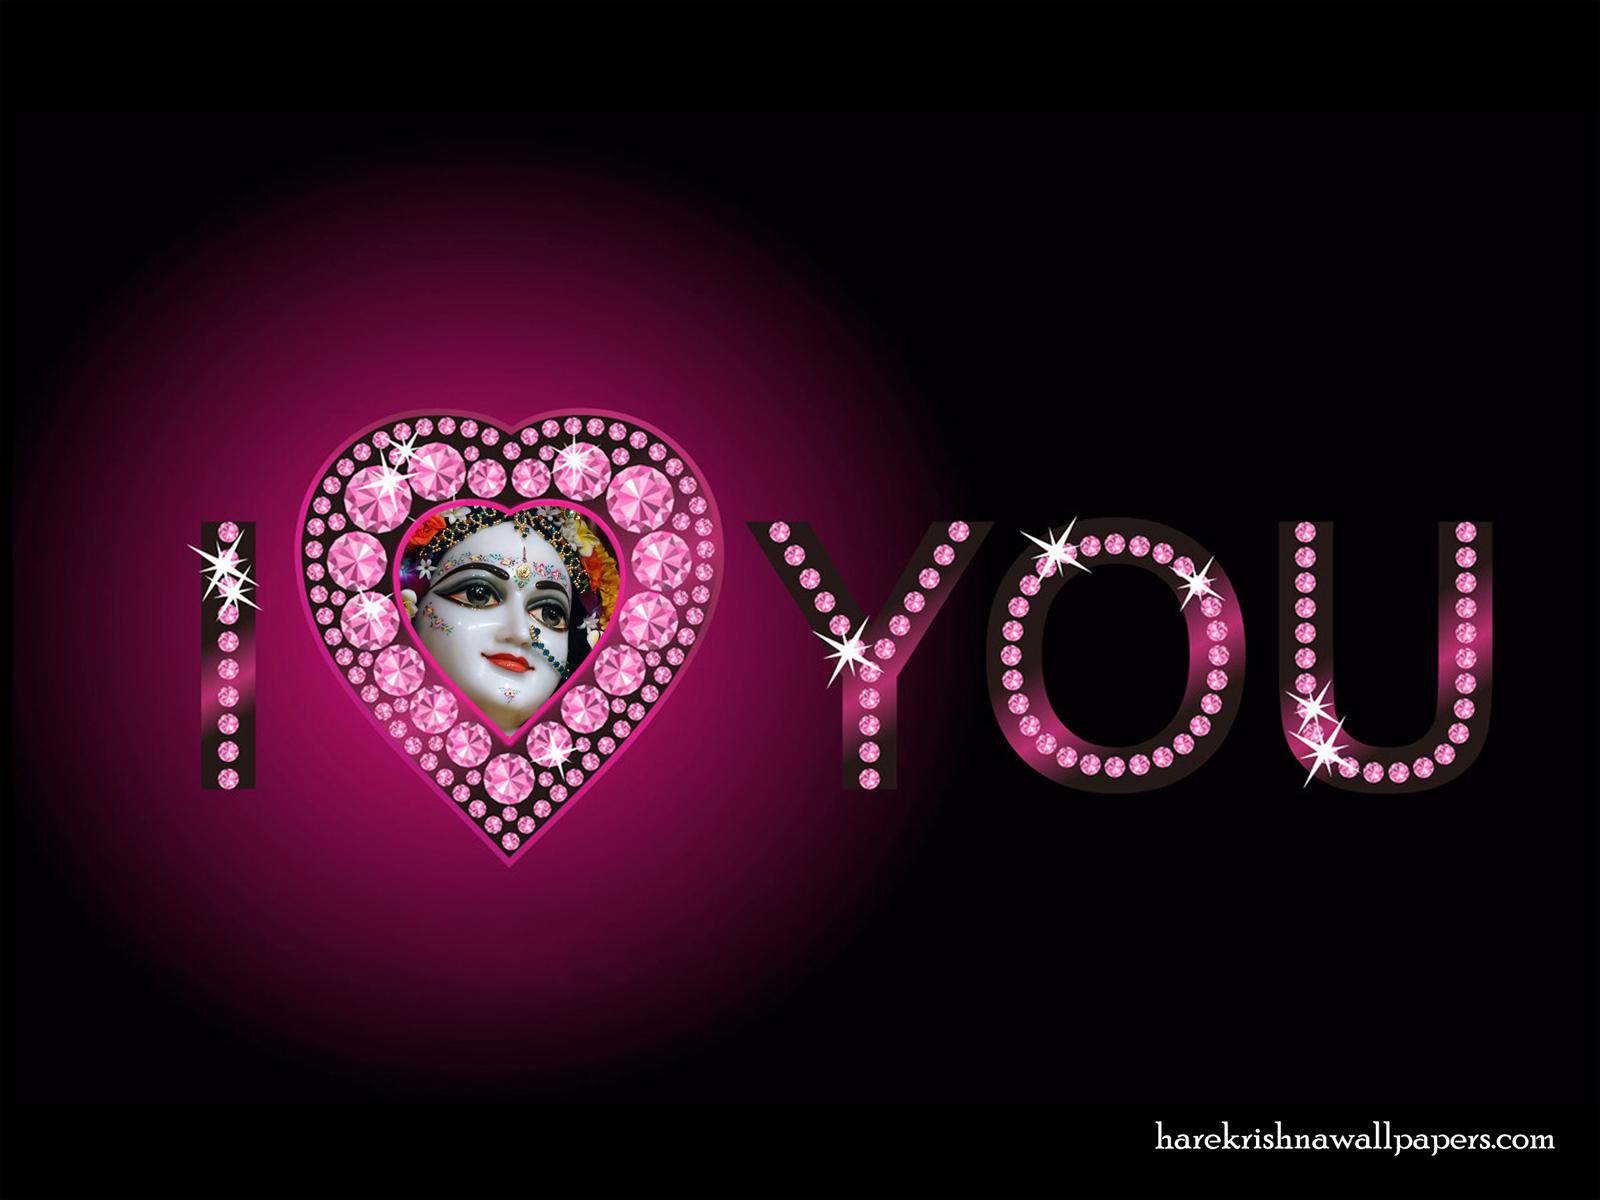 I Love You Radharani Wallpaper (013) Size1600x1200 Download